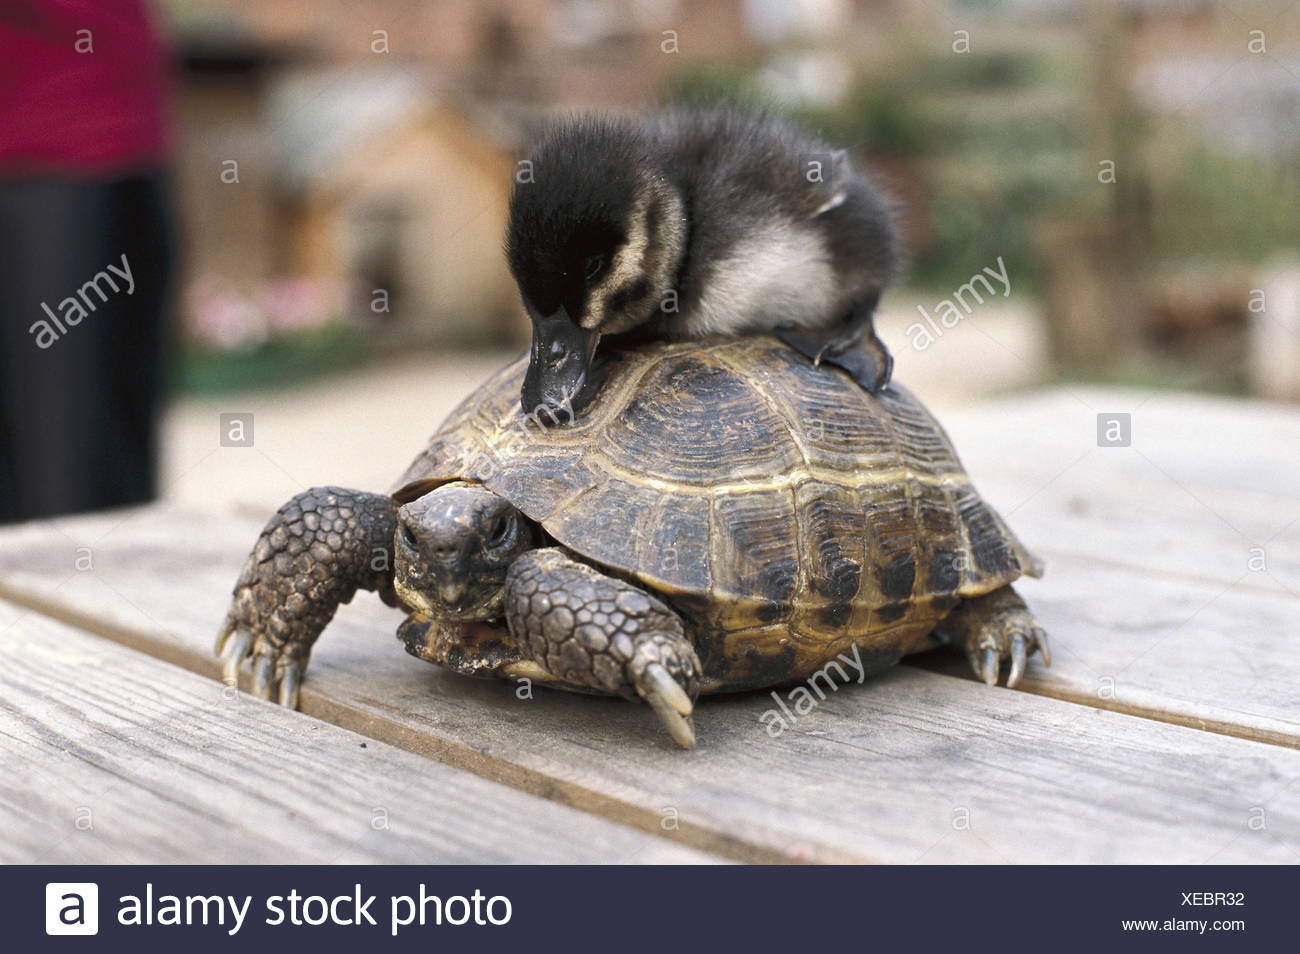 Land Schildkrote Testudo Spec Carry Entenkuken Schlaf Reptilien